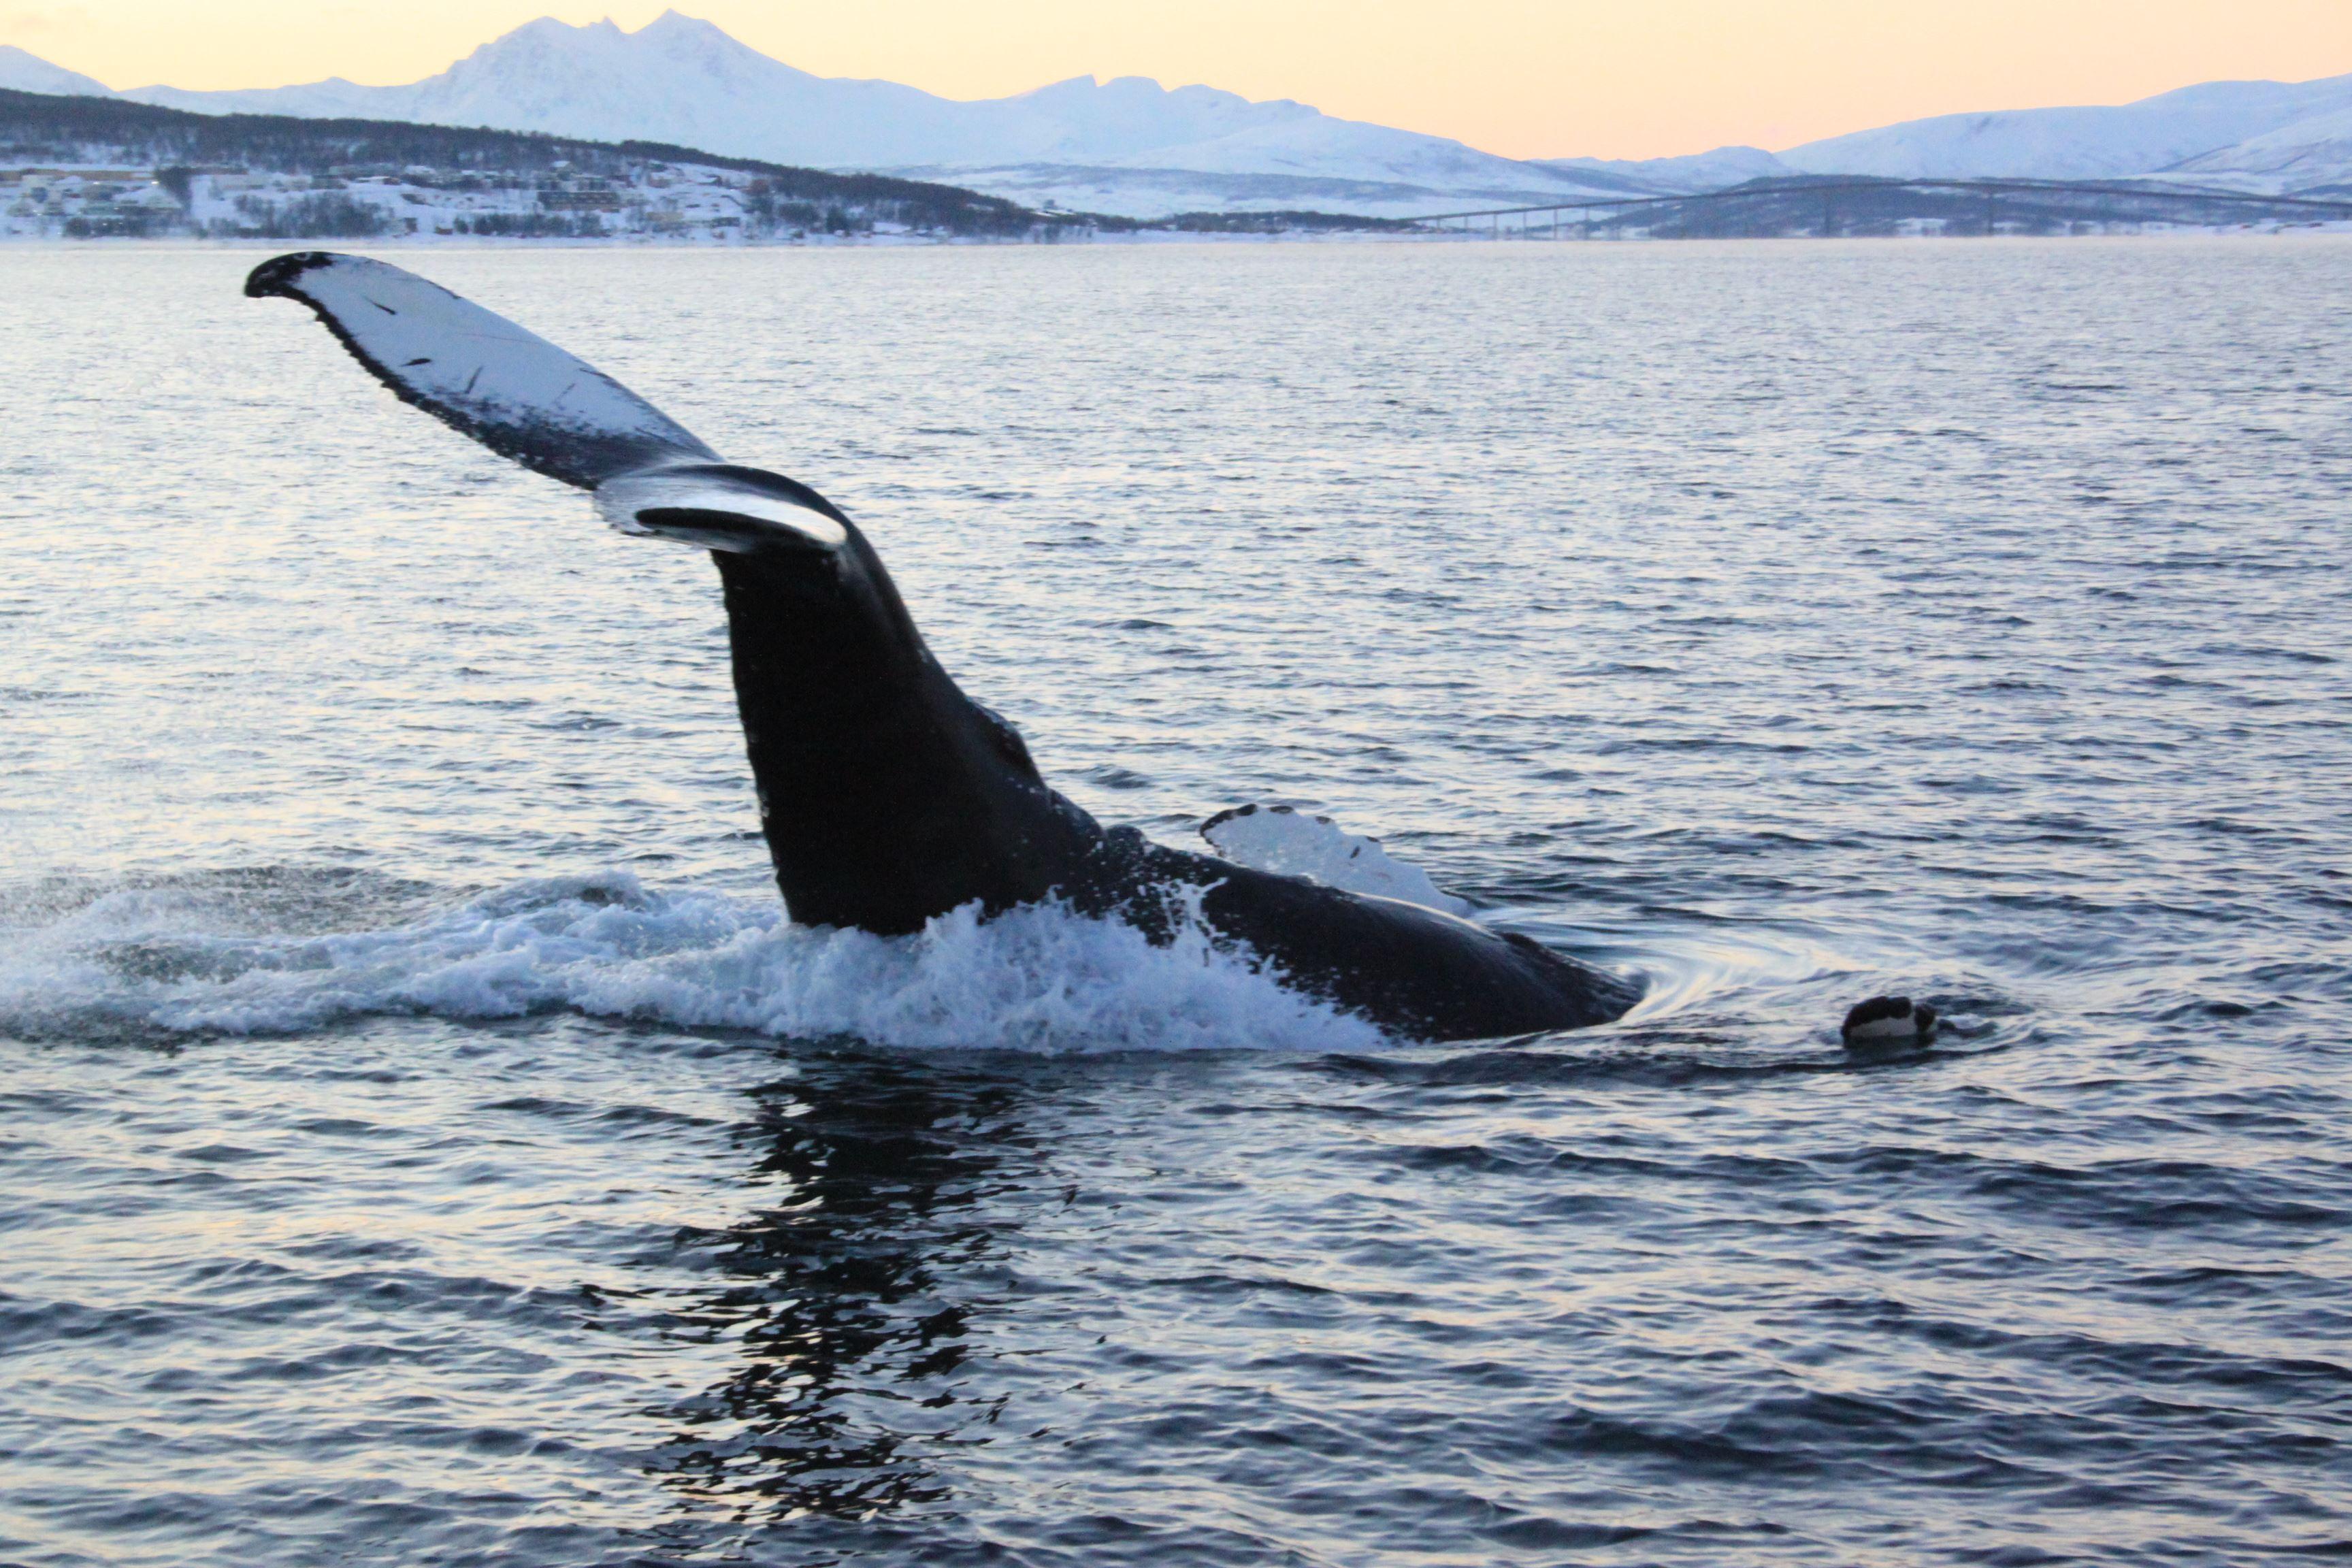 Polar whalesafari to Skjervøy - Polar Adventures